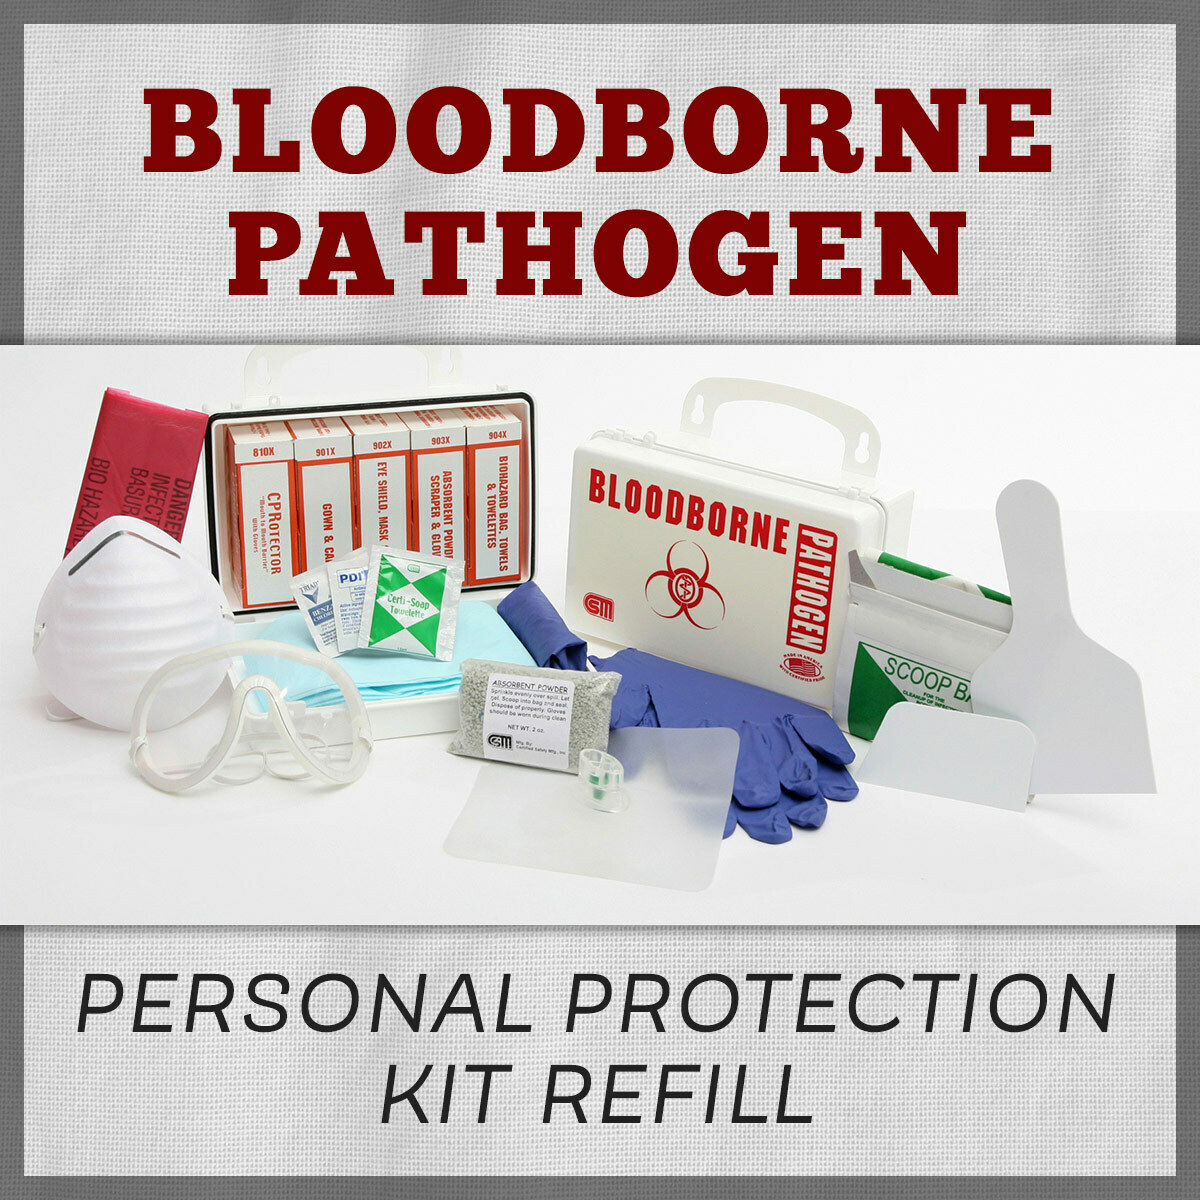 Bloodborne Pathogen Personal Protection Kit Refill